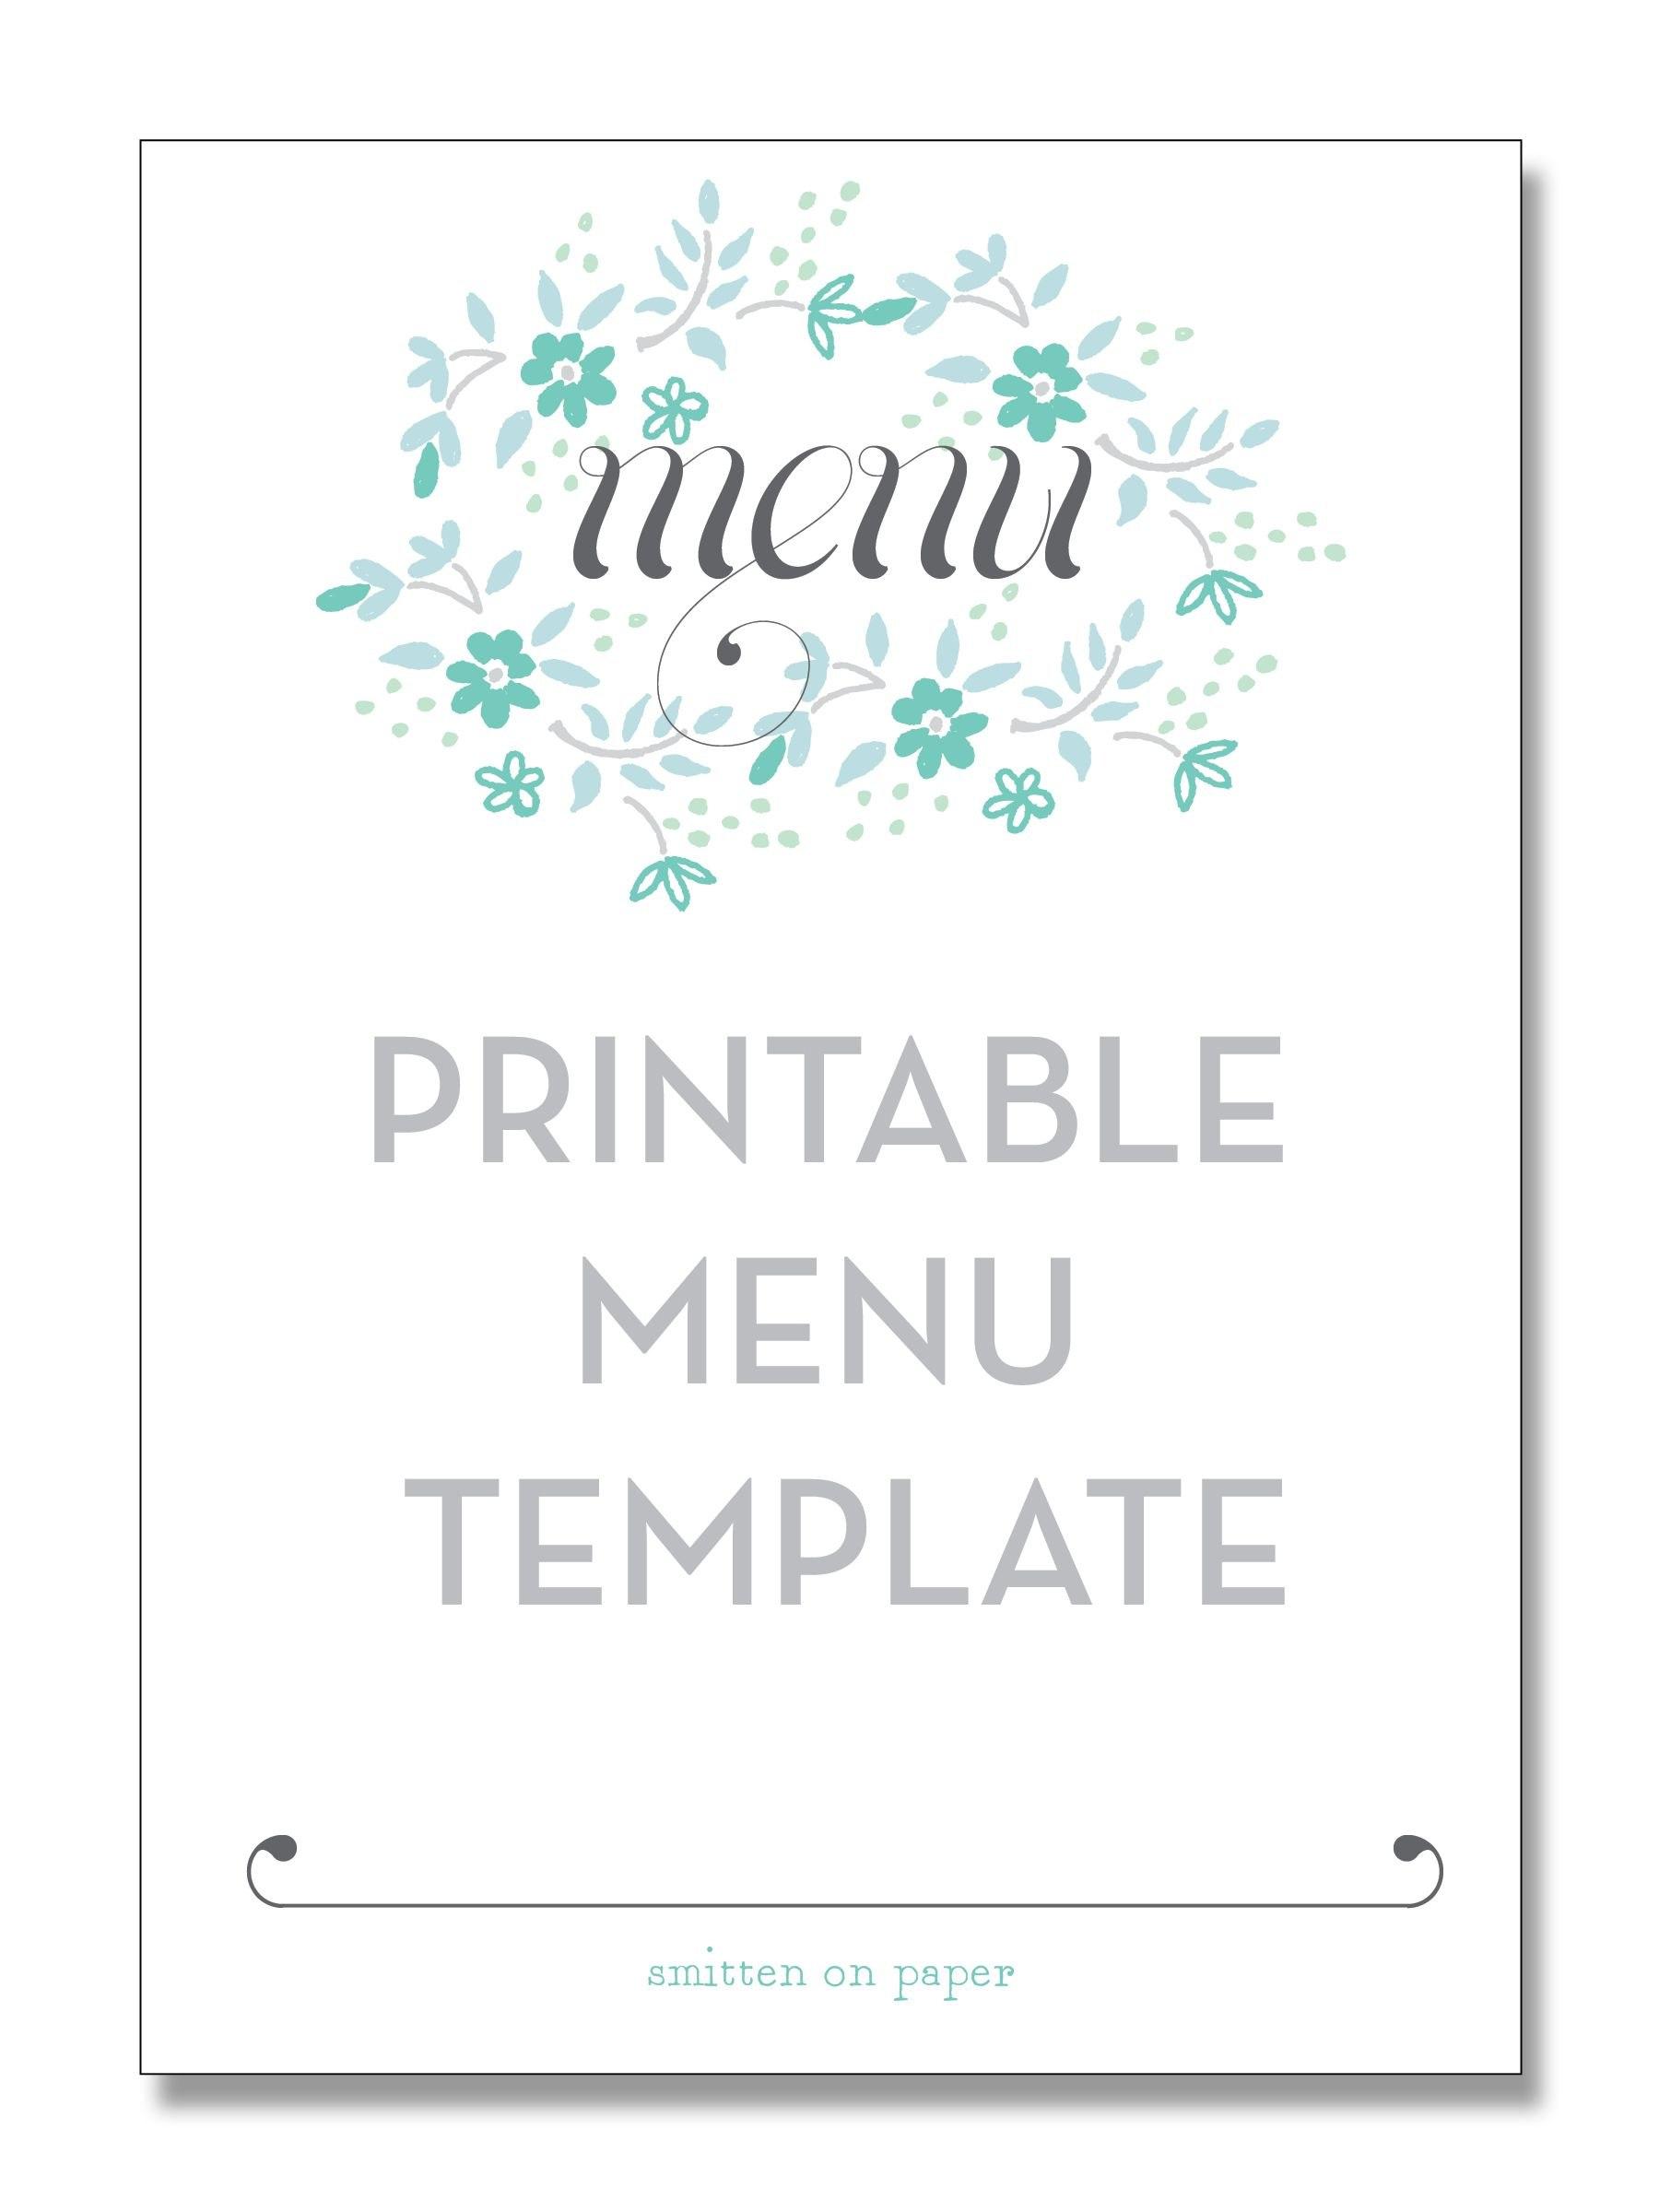 Freebie Friday Printable Menu  Party Time  Printable Menu Menu In Free Printable Restaurant Menu Templates